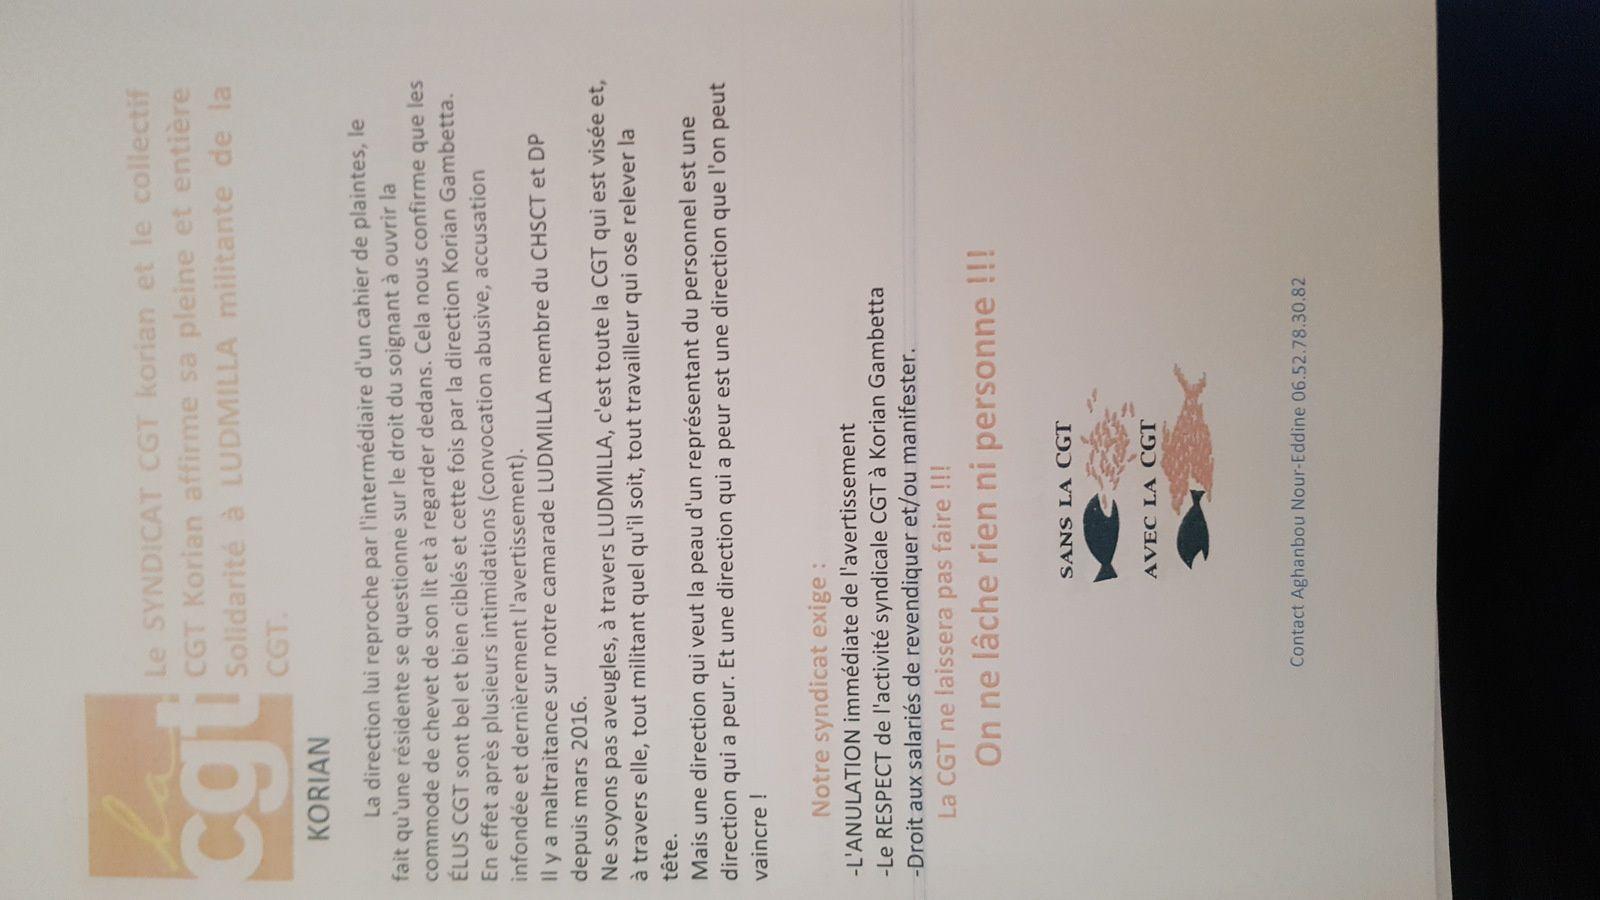 Tract de soutien de notre camarade Ludmilla DP Korian Gambetta Lille.